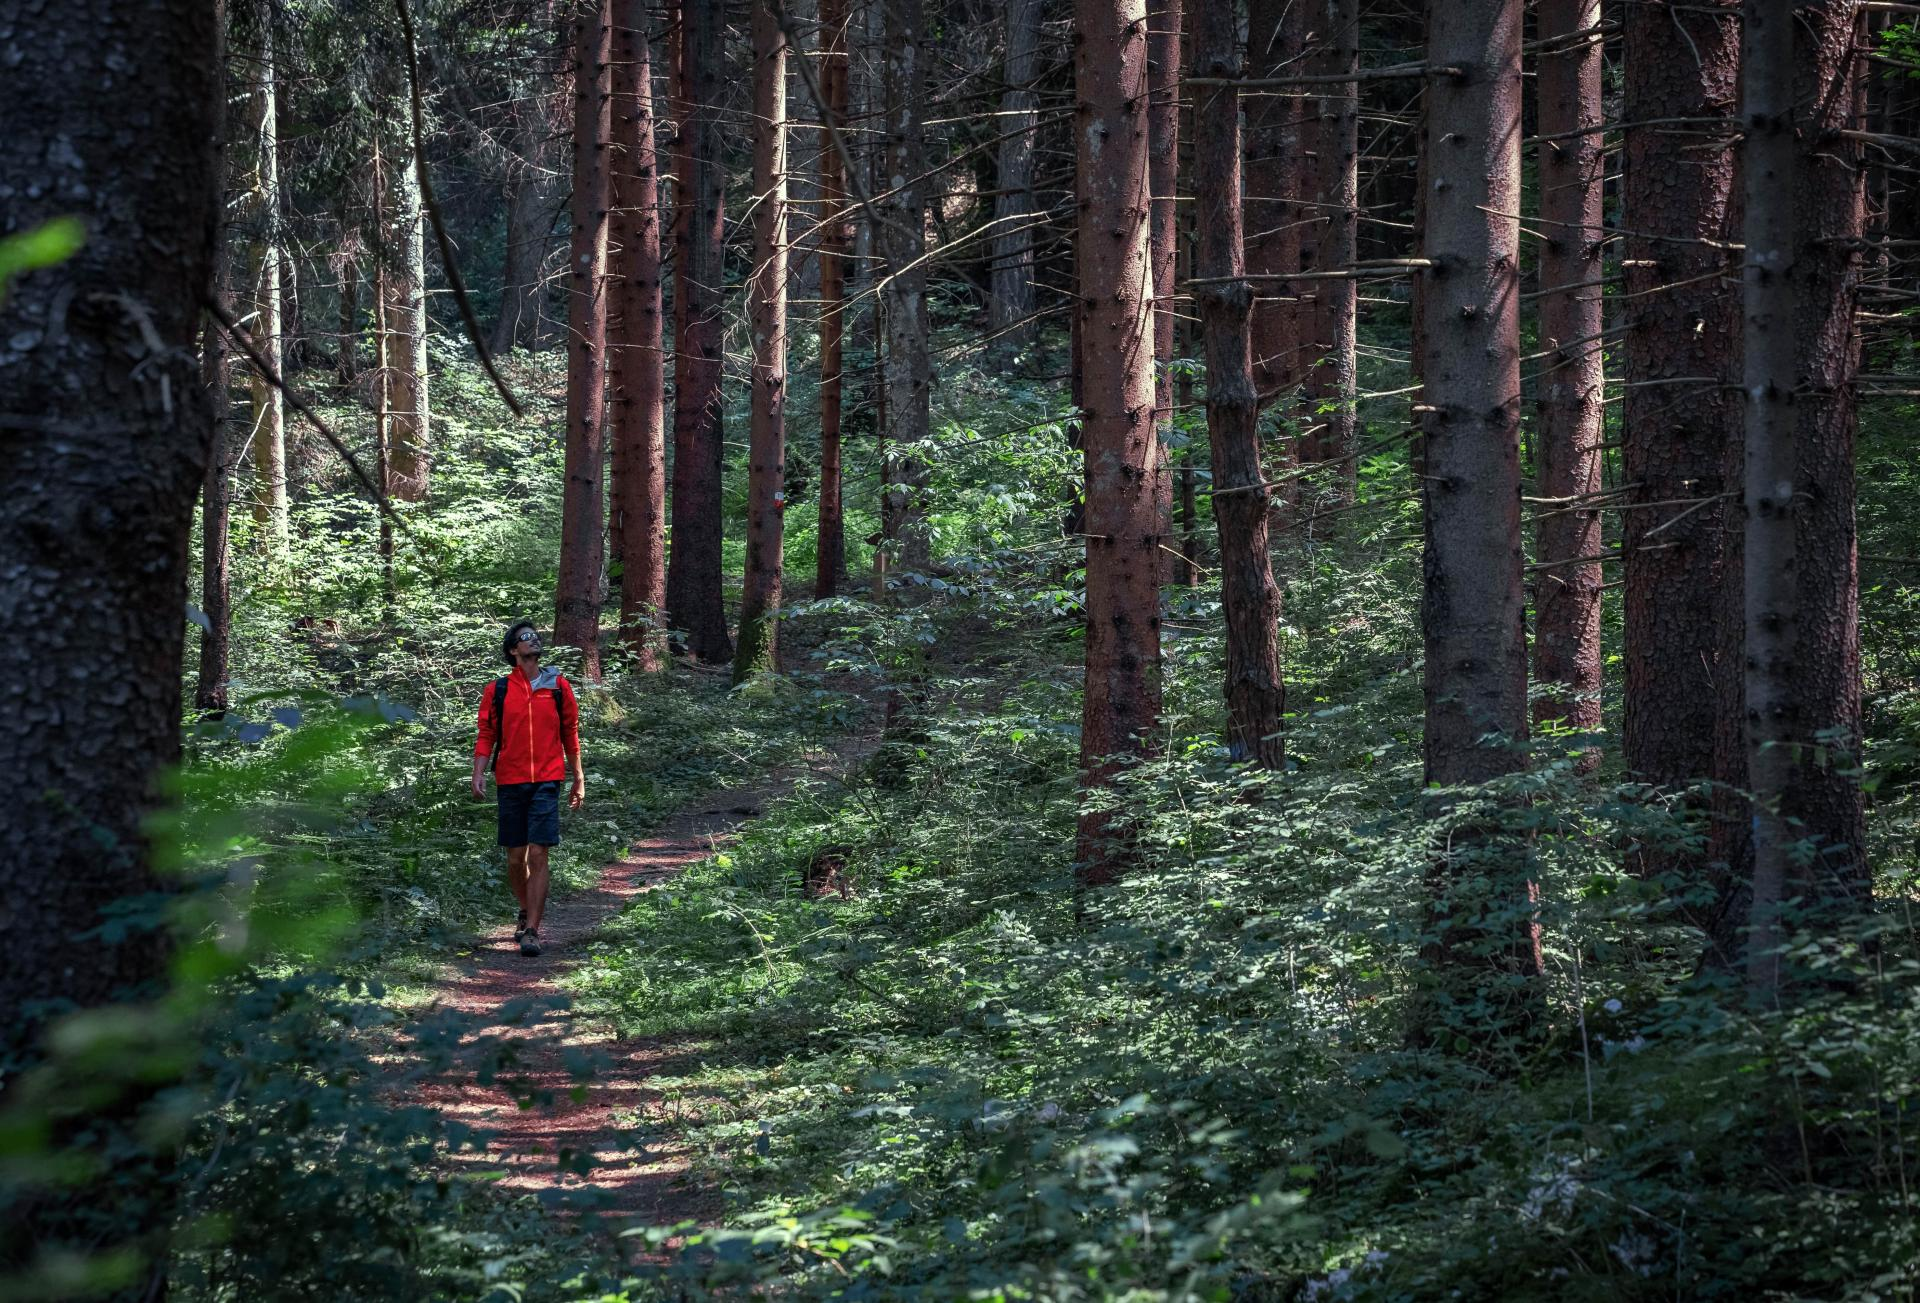 Il Parco del Respiro: Forest bathing in Paganella